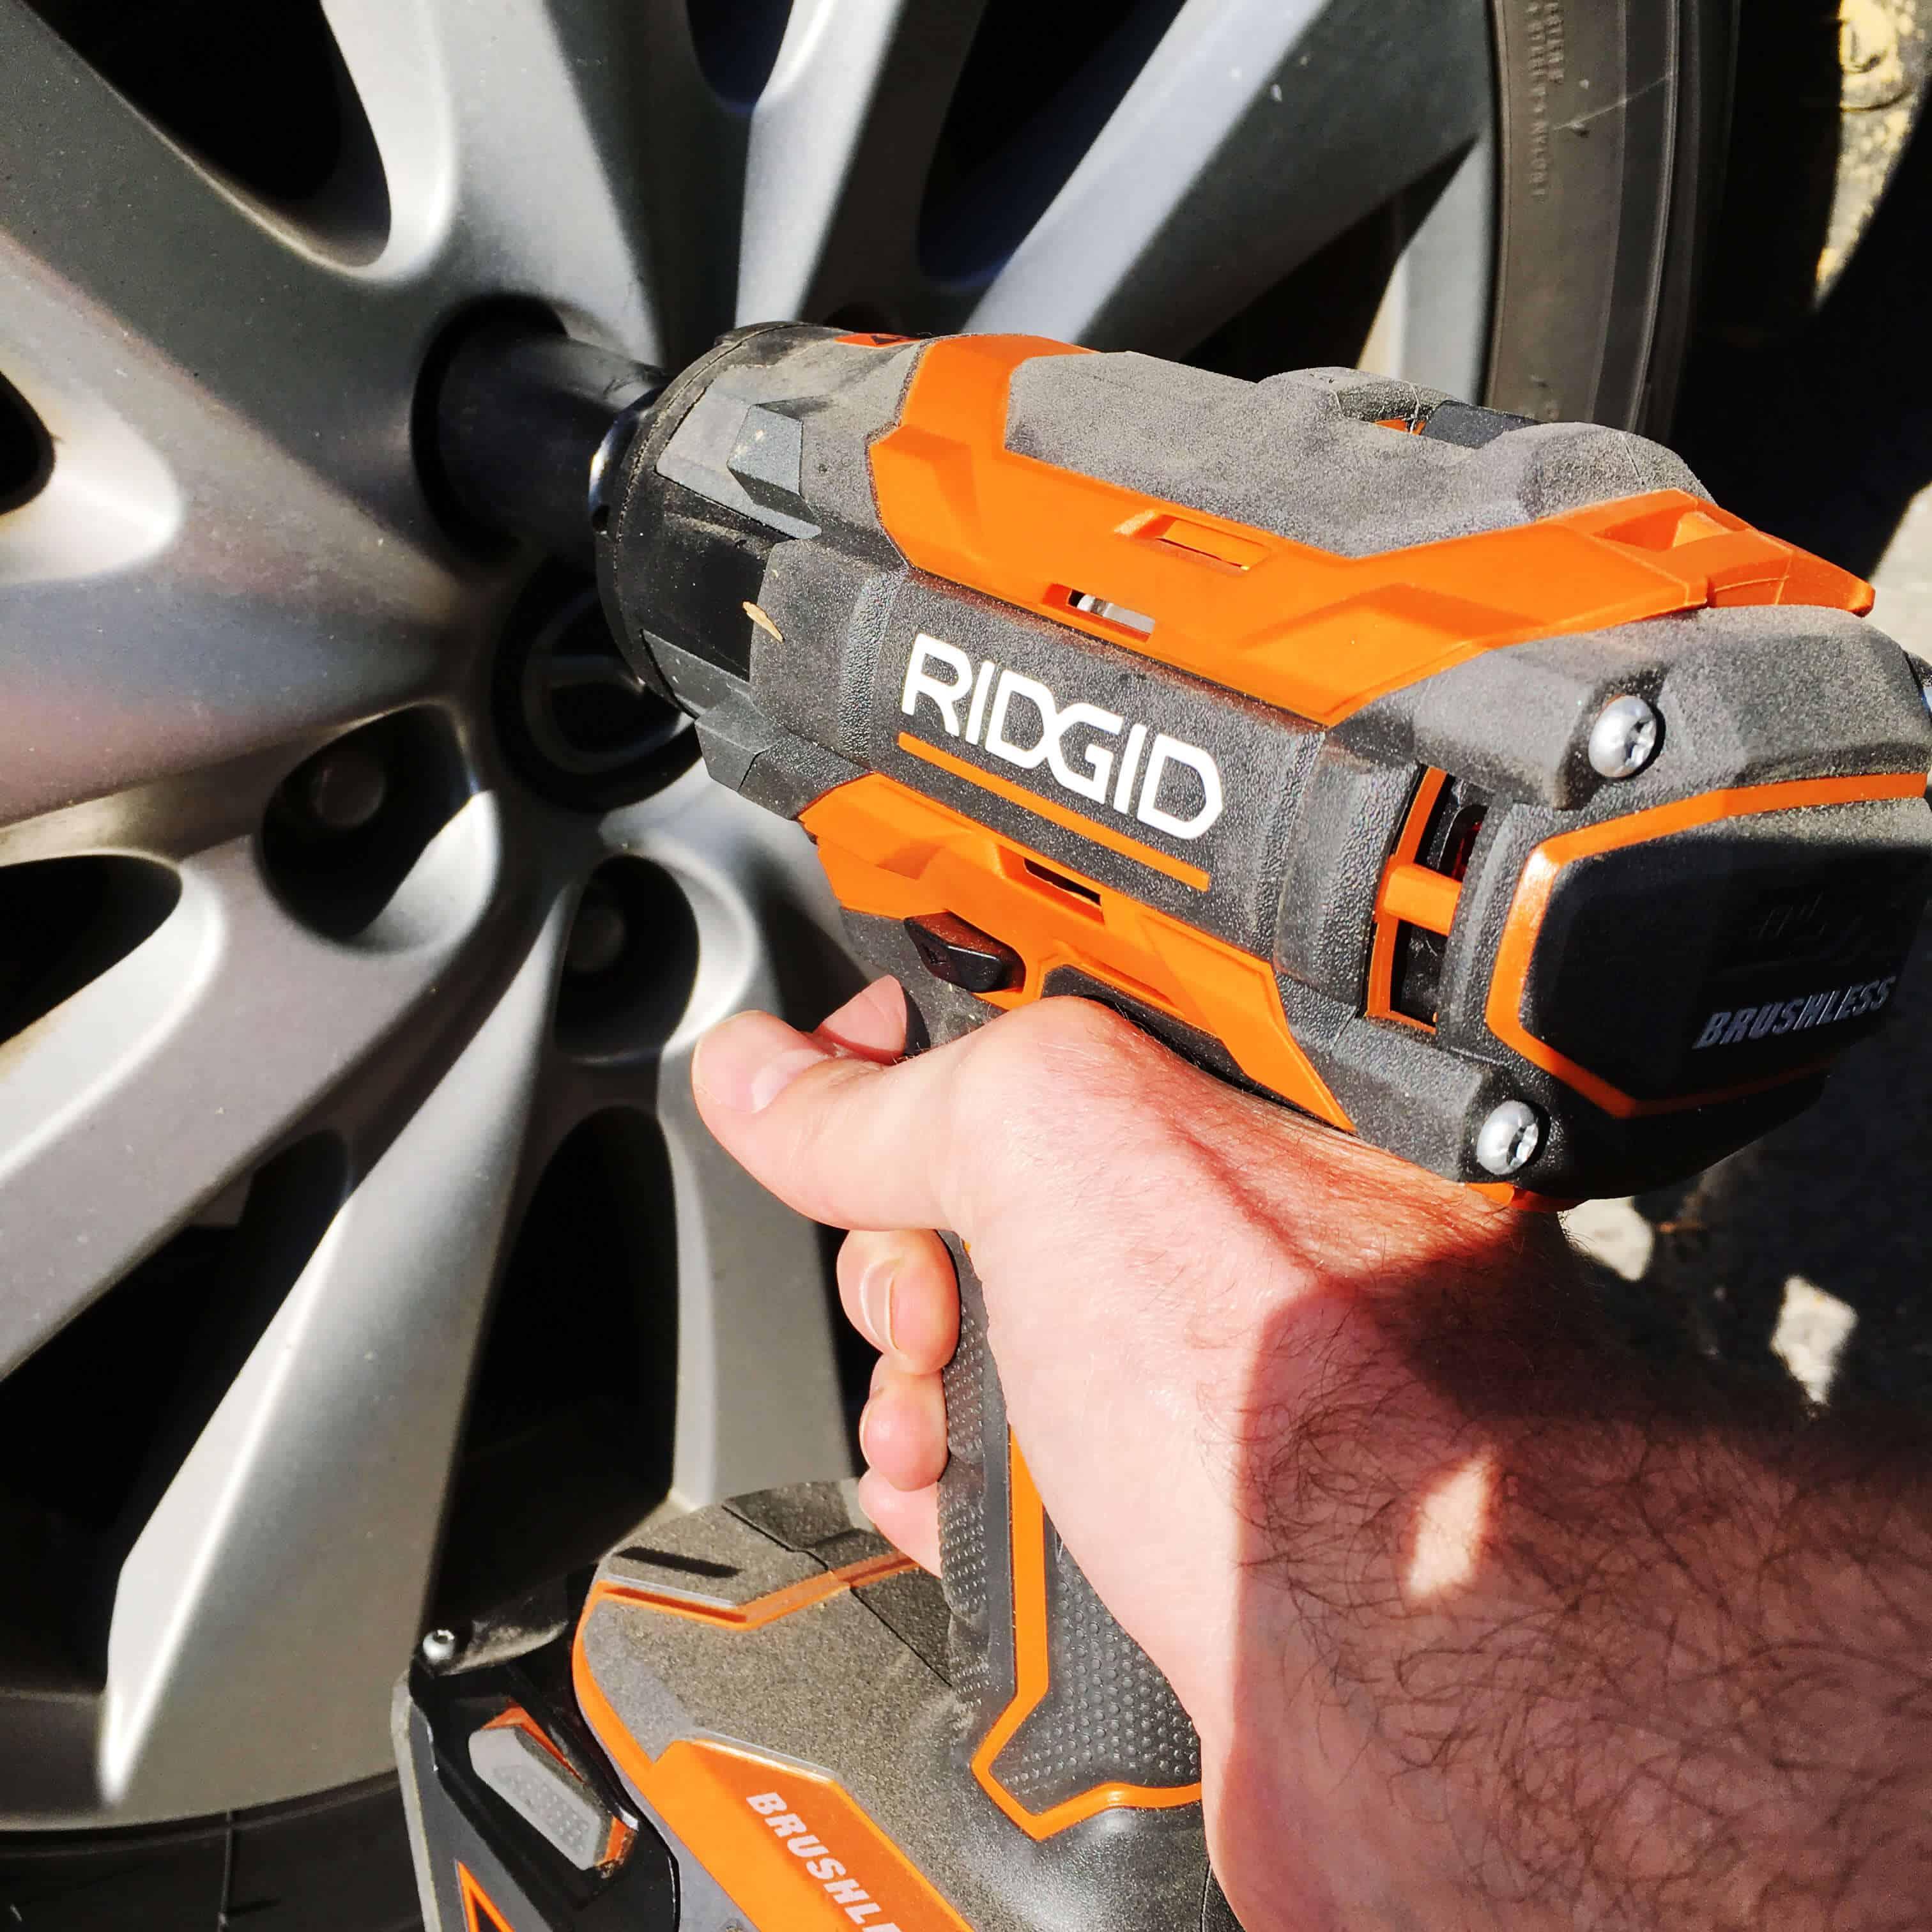 Ridgid Impact Wrench